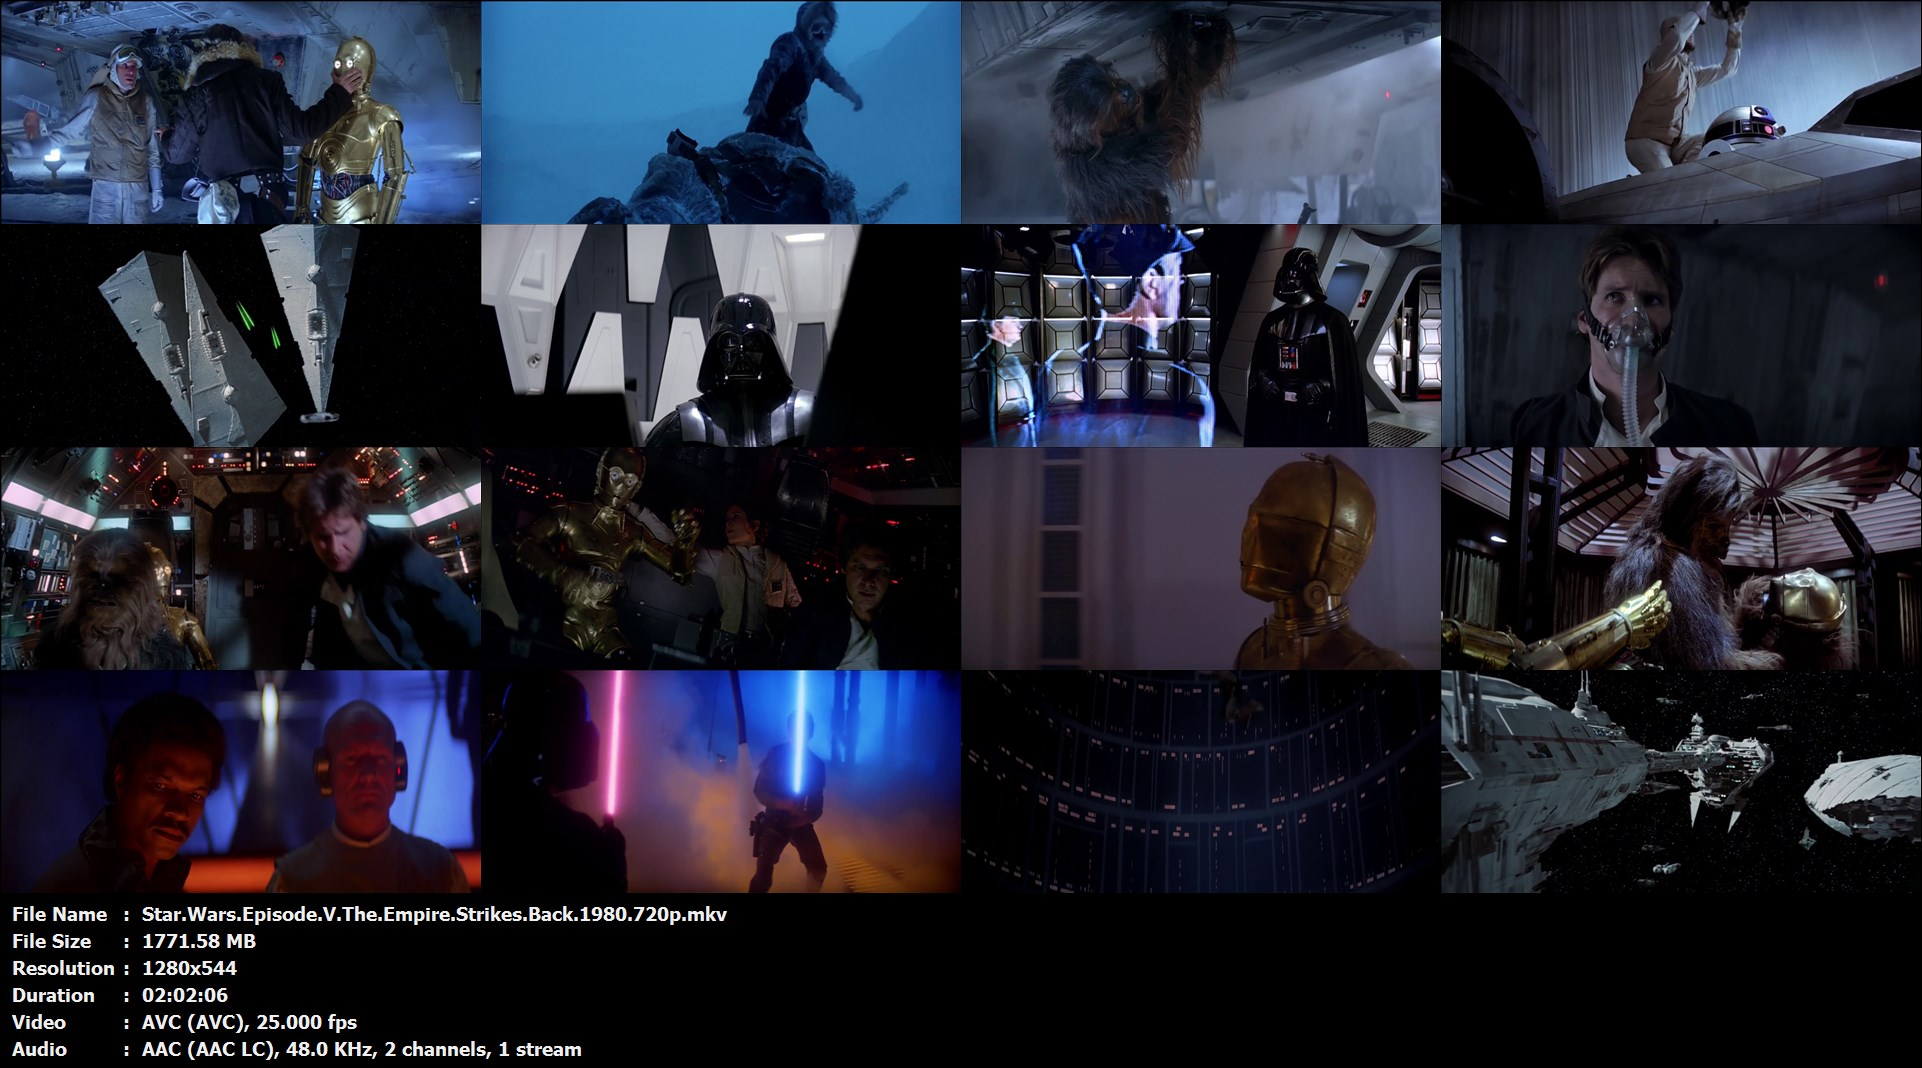 The Empire Strikes Back - Wikipedia, the free encyclopedia